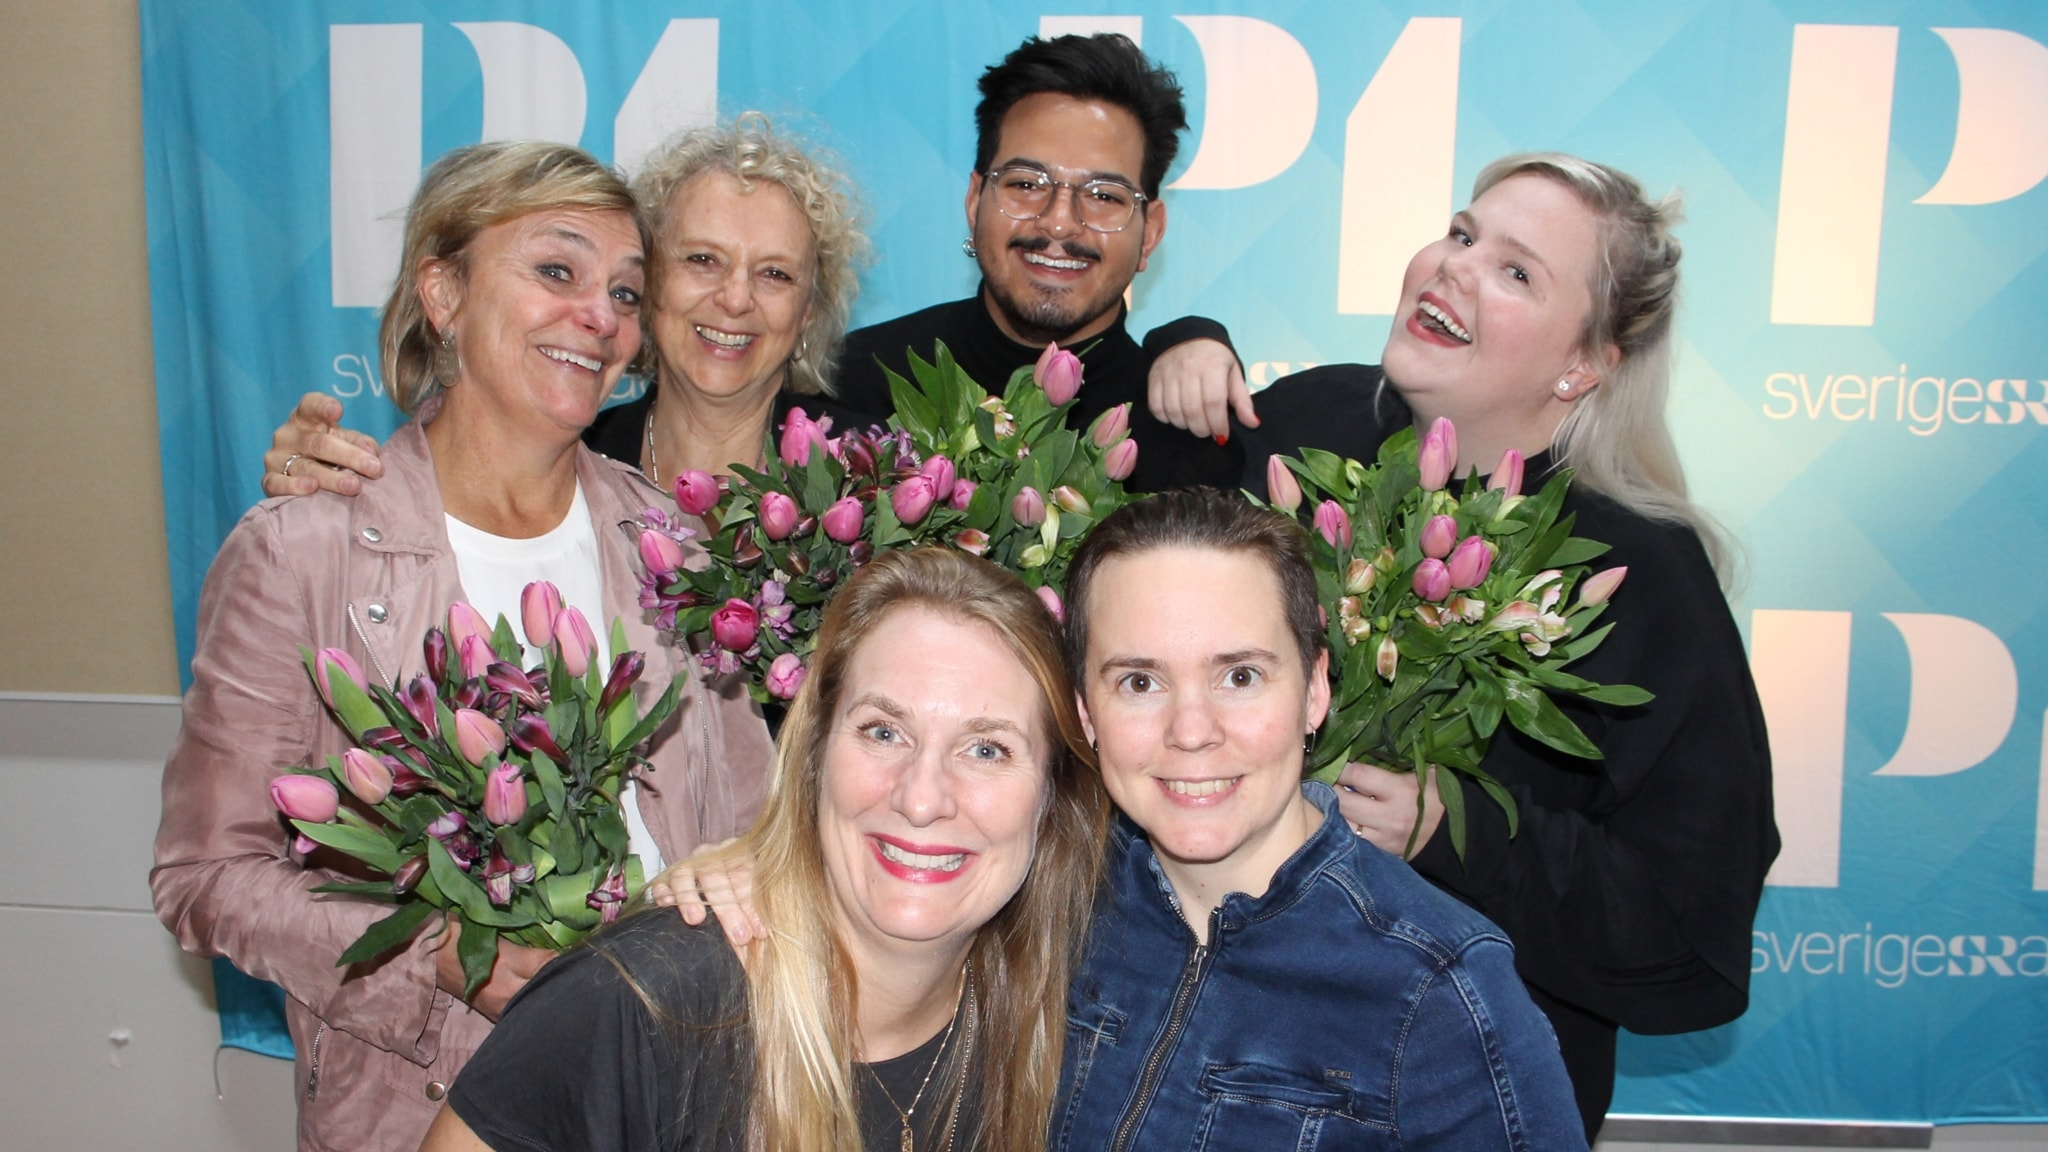 Linnea Wikblad, Alex Letic, Eva Hamilton och Eva Landahl!